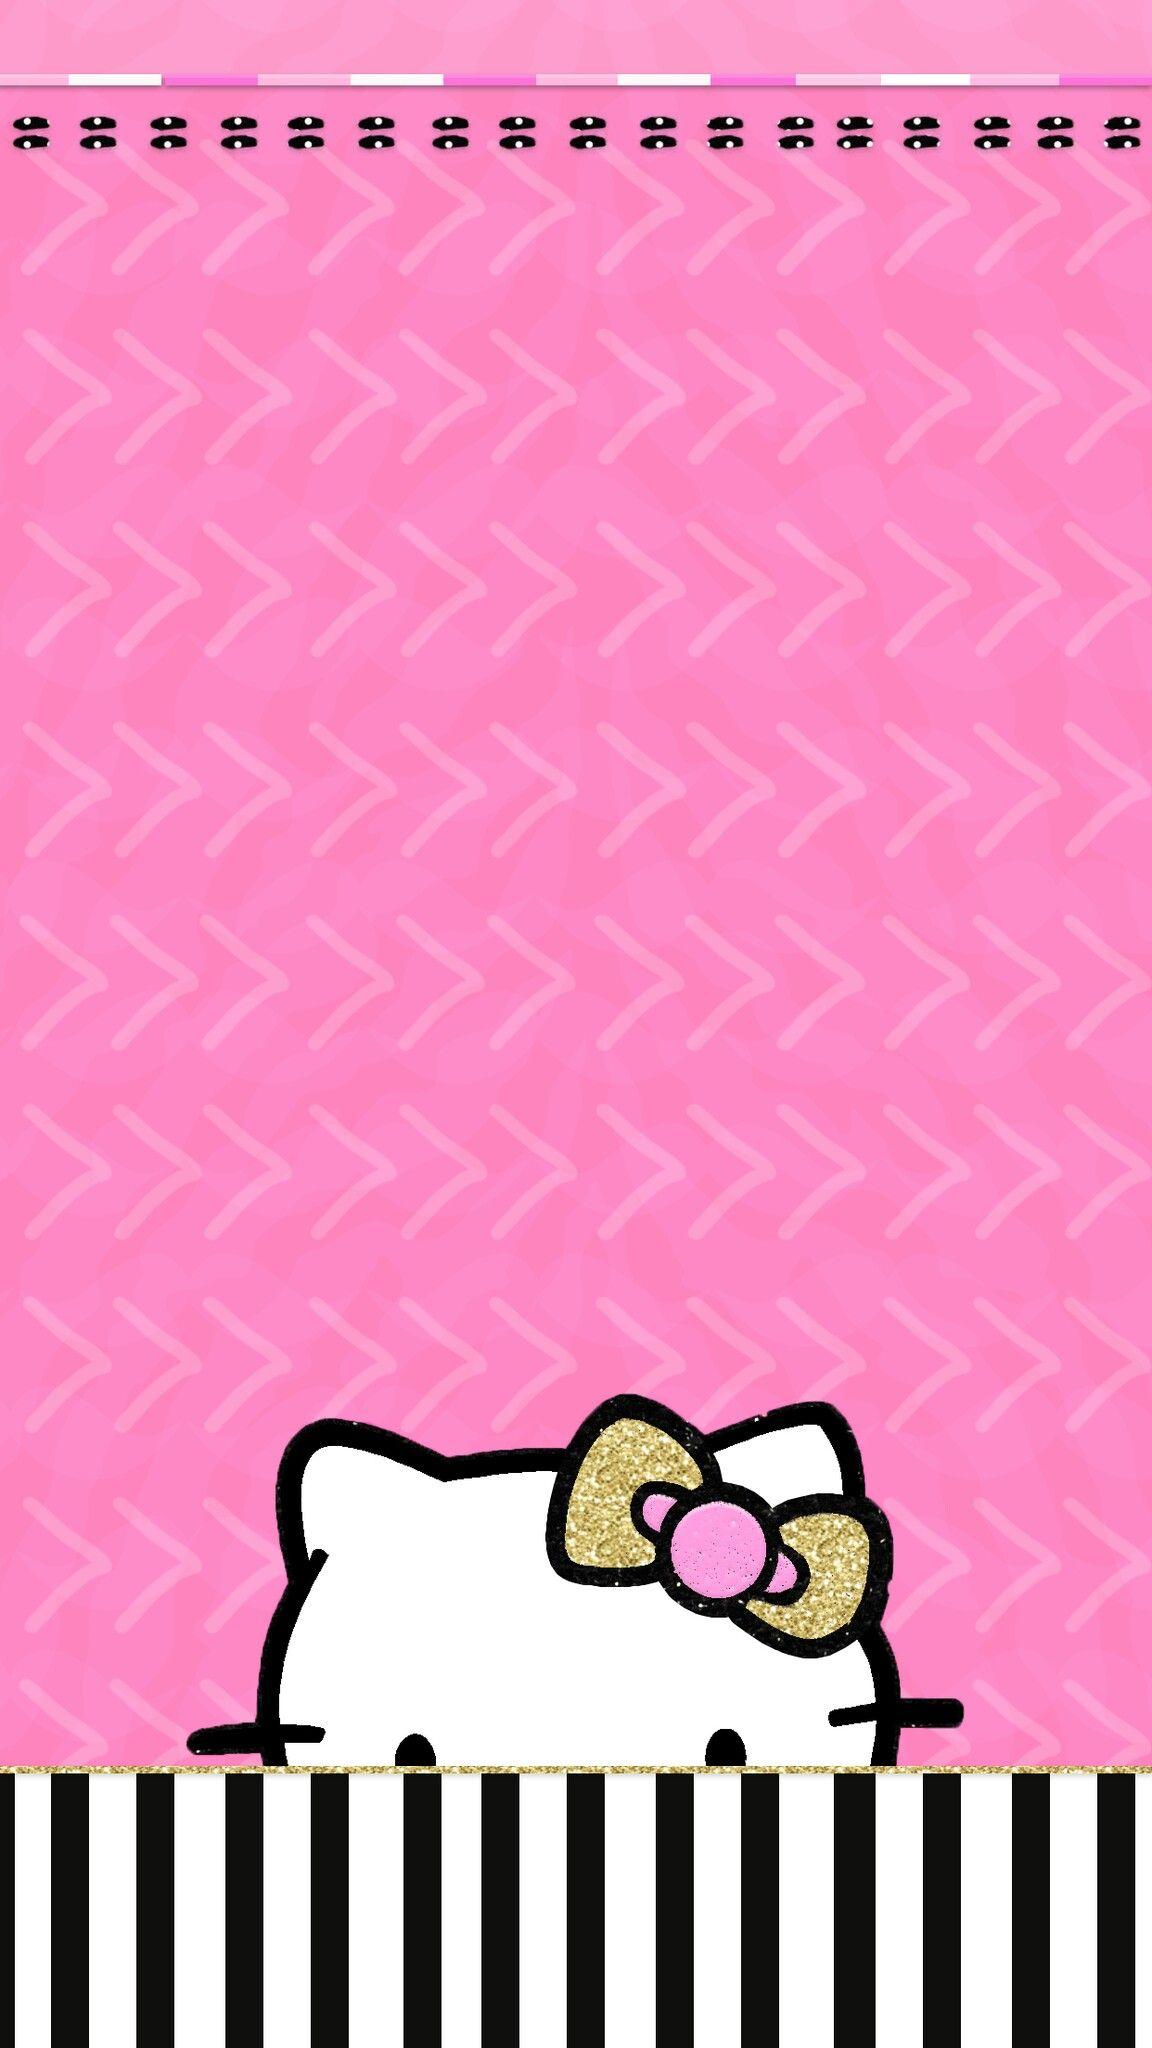 Download Wallpaper Hello Kitty Iphone 4 - 6abebd0ddef9f06bca73314f68e5ecb9  Graphic_525963.jpg